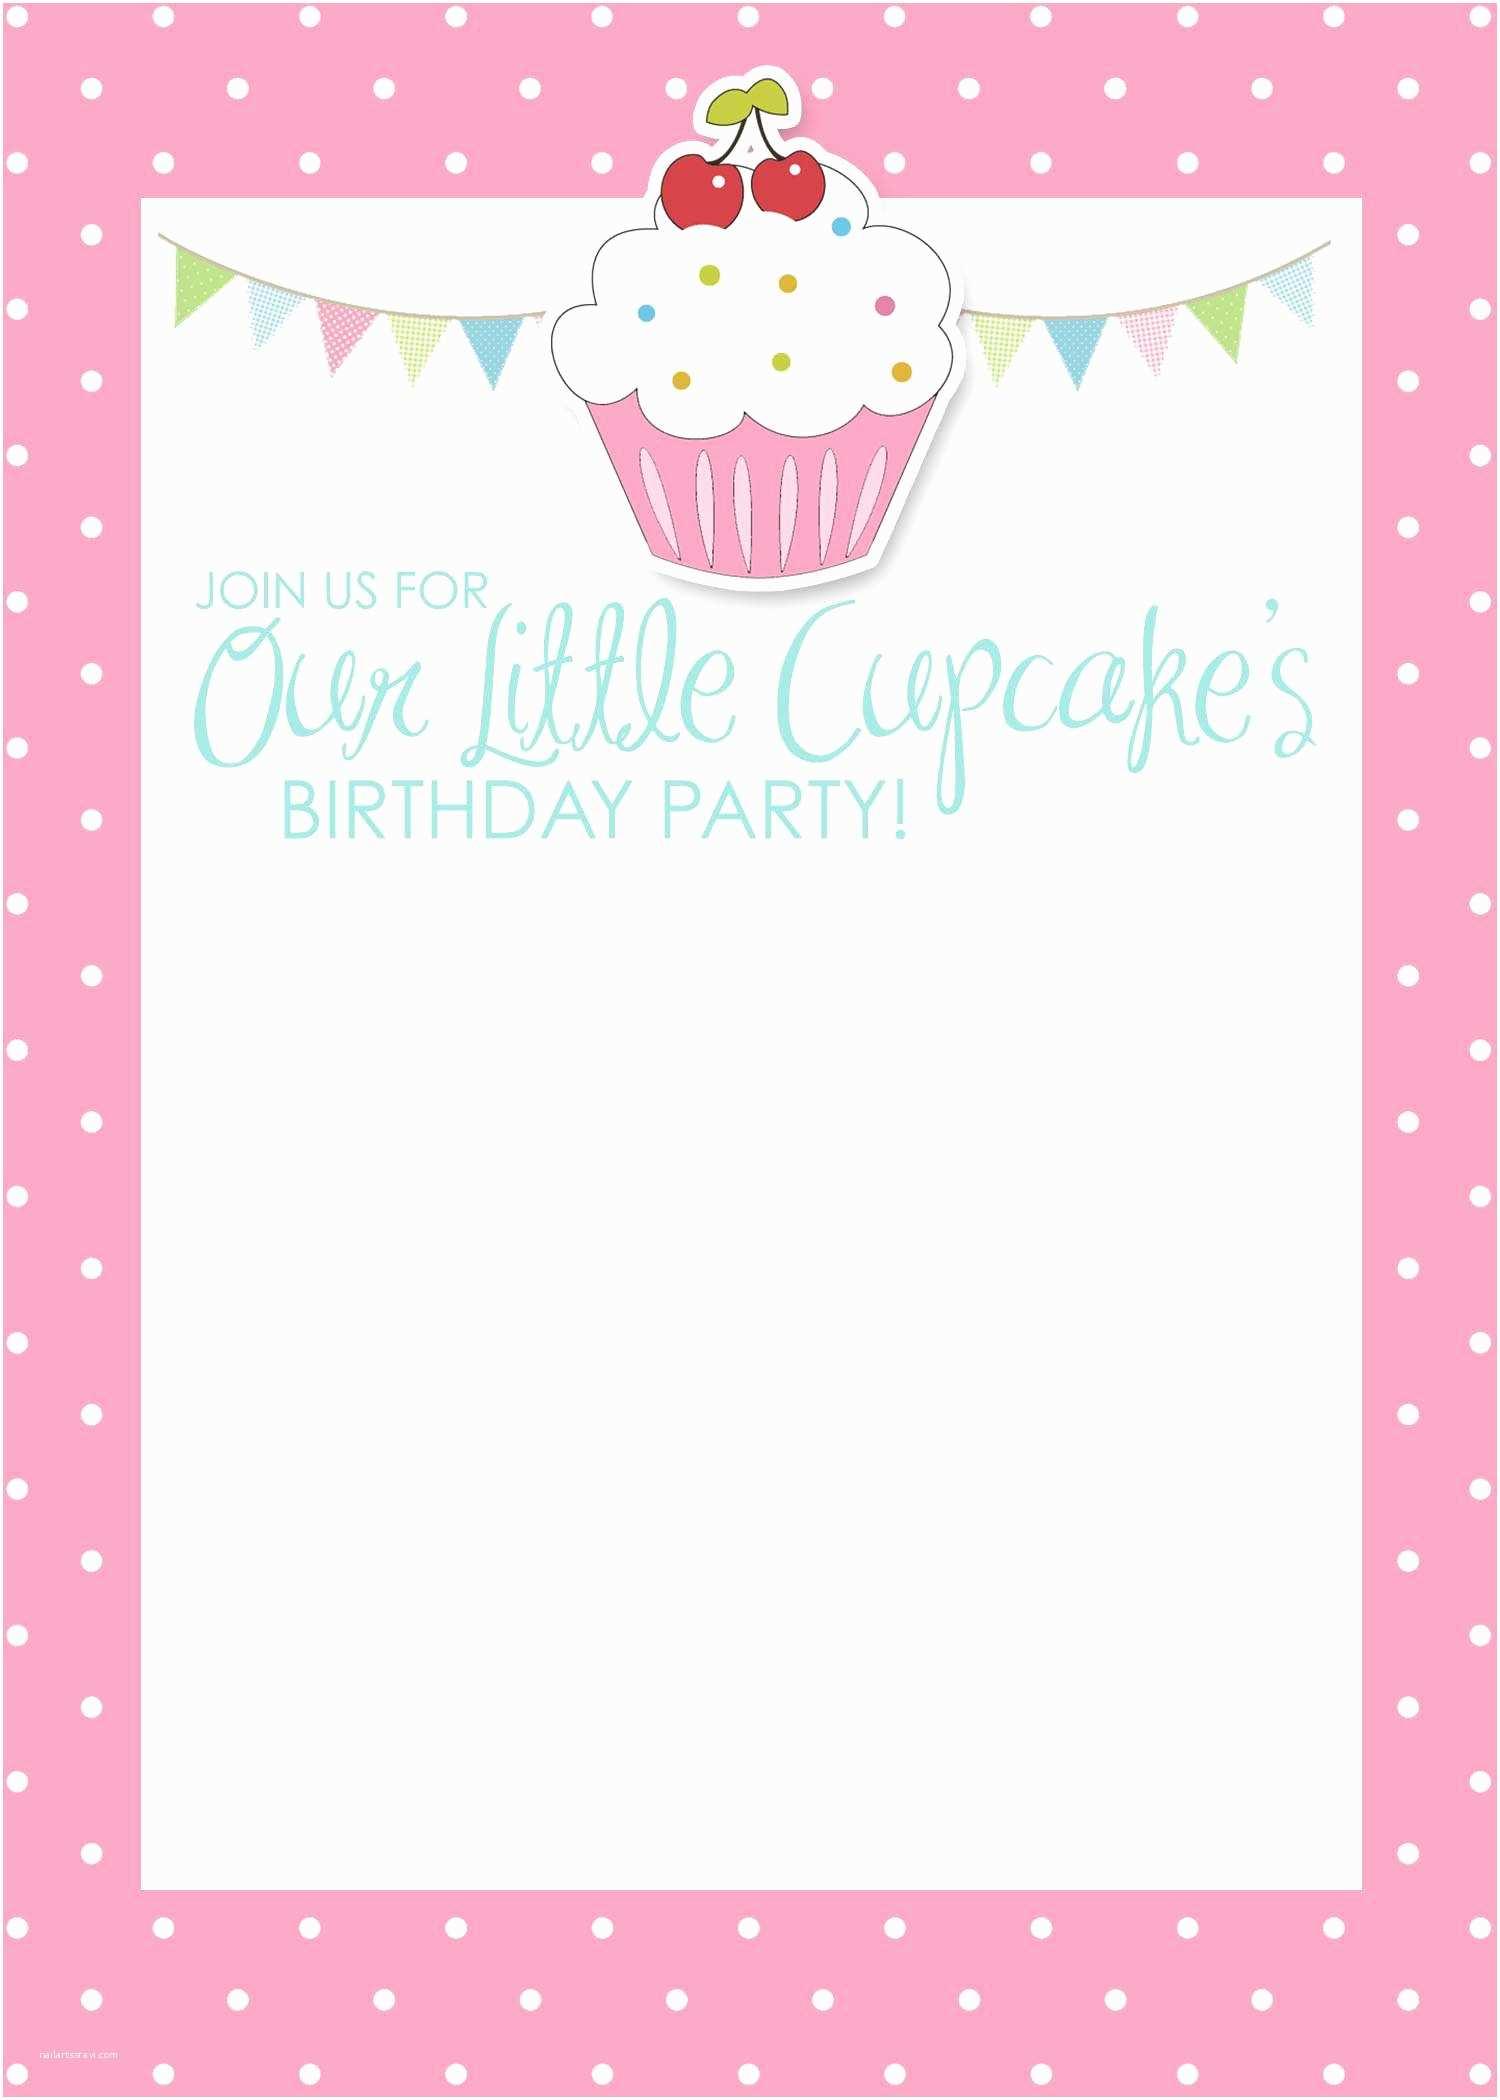 Free Birthday Party Invitation Templates Birthday Invitation Card Template Birthday Invitation